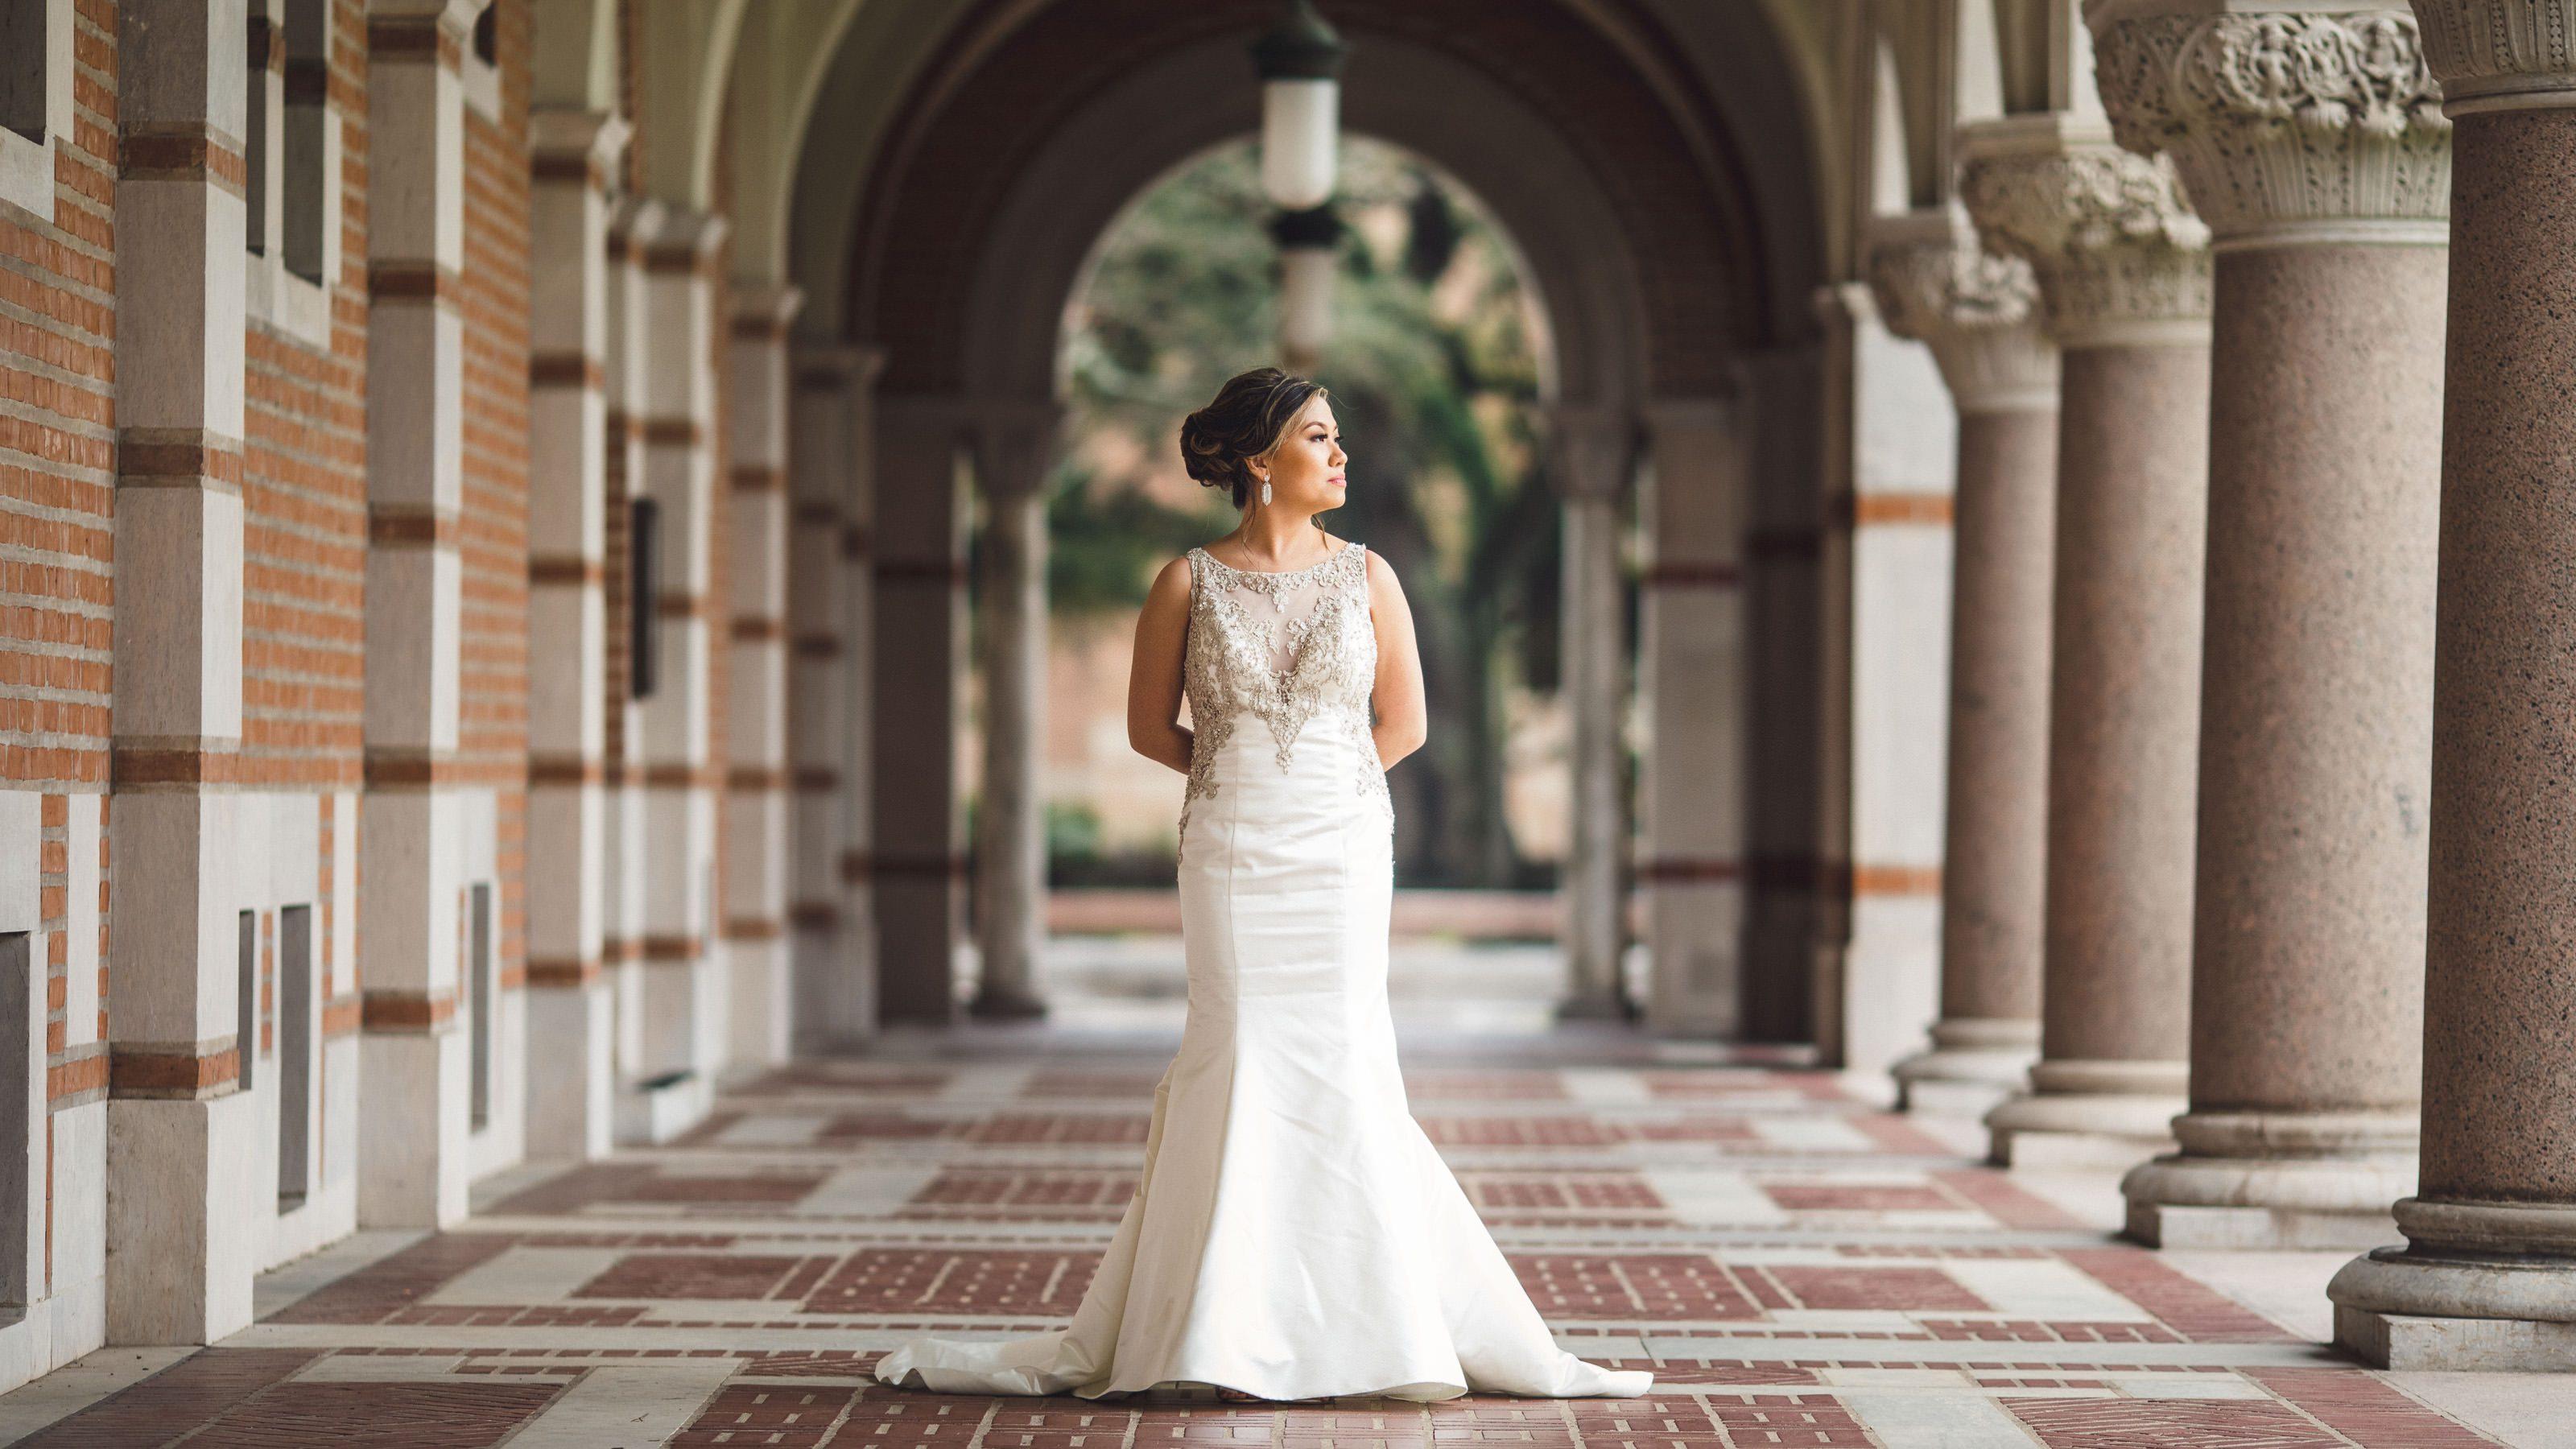 Rice University Bridals // Audrey